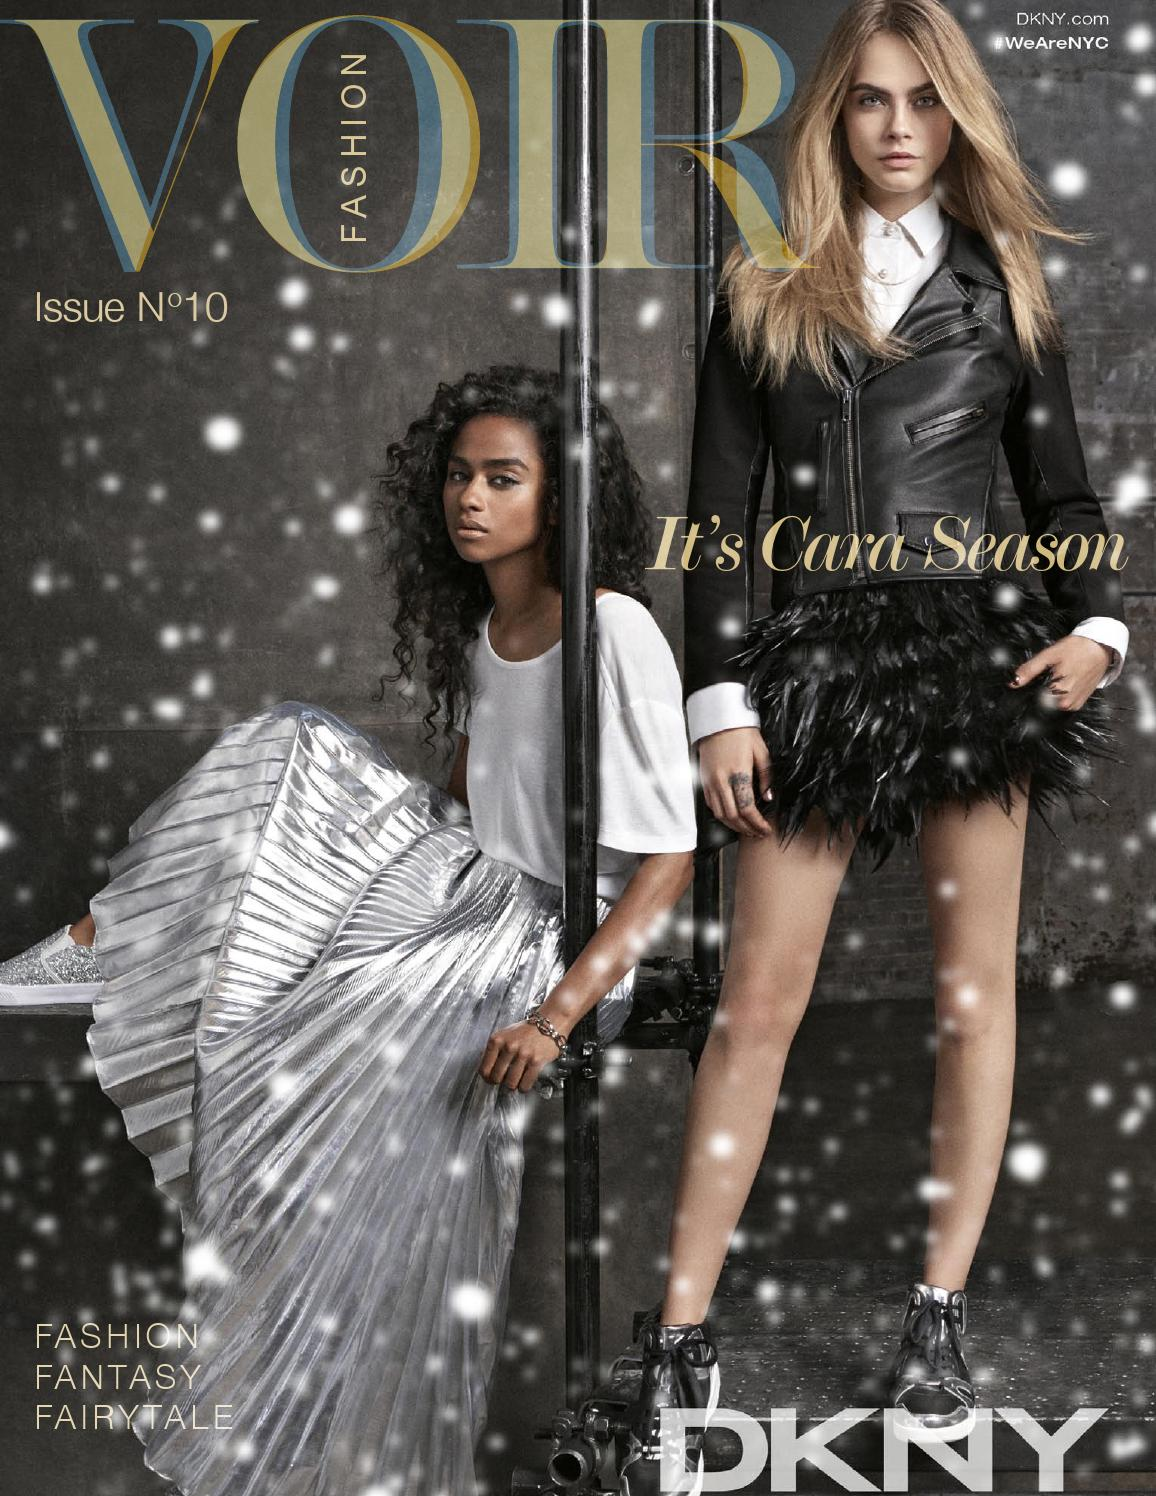 Voir Fashion Issue 10 Cara Season Cara Delevingne By Voir Fashion Magazine Issuu